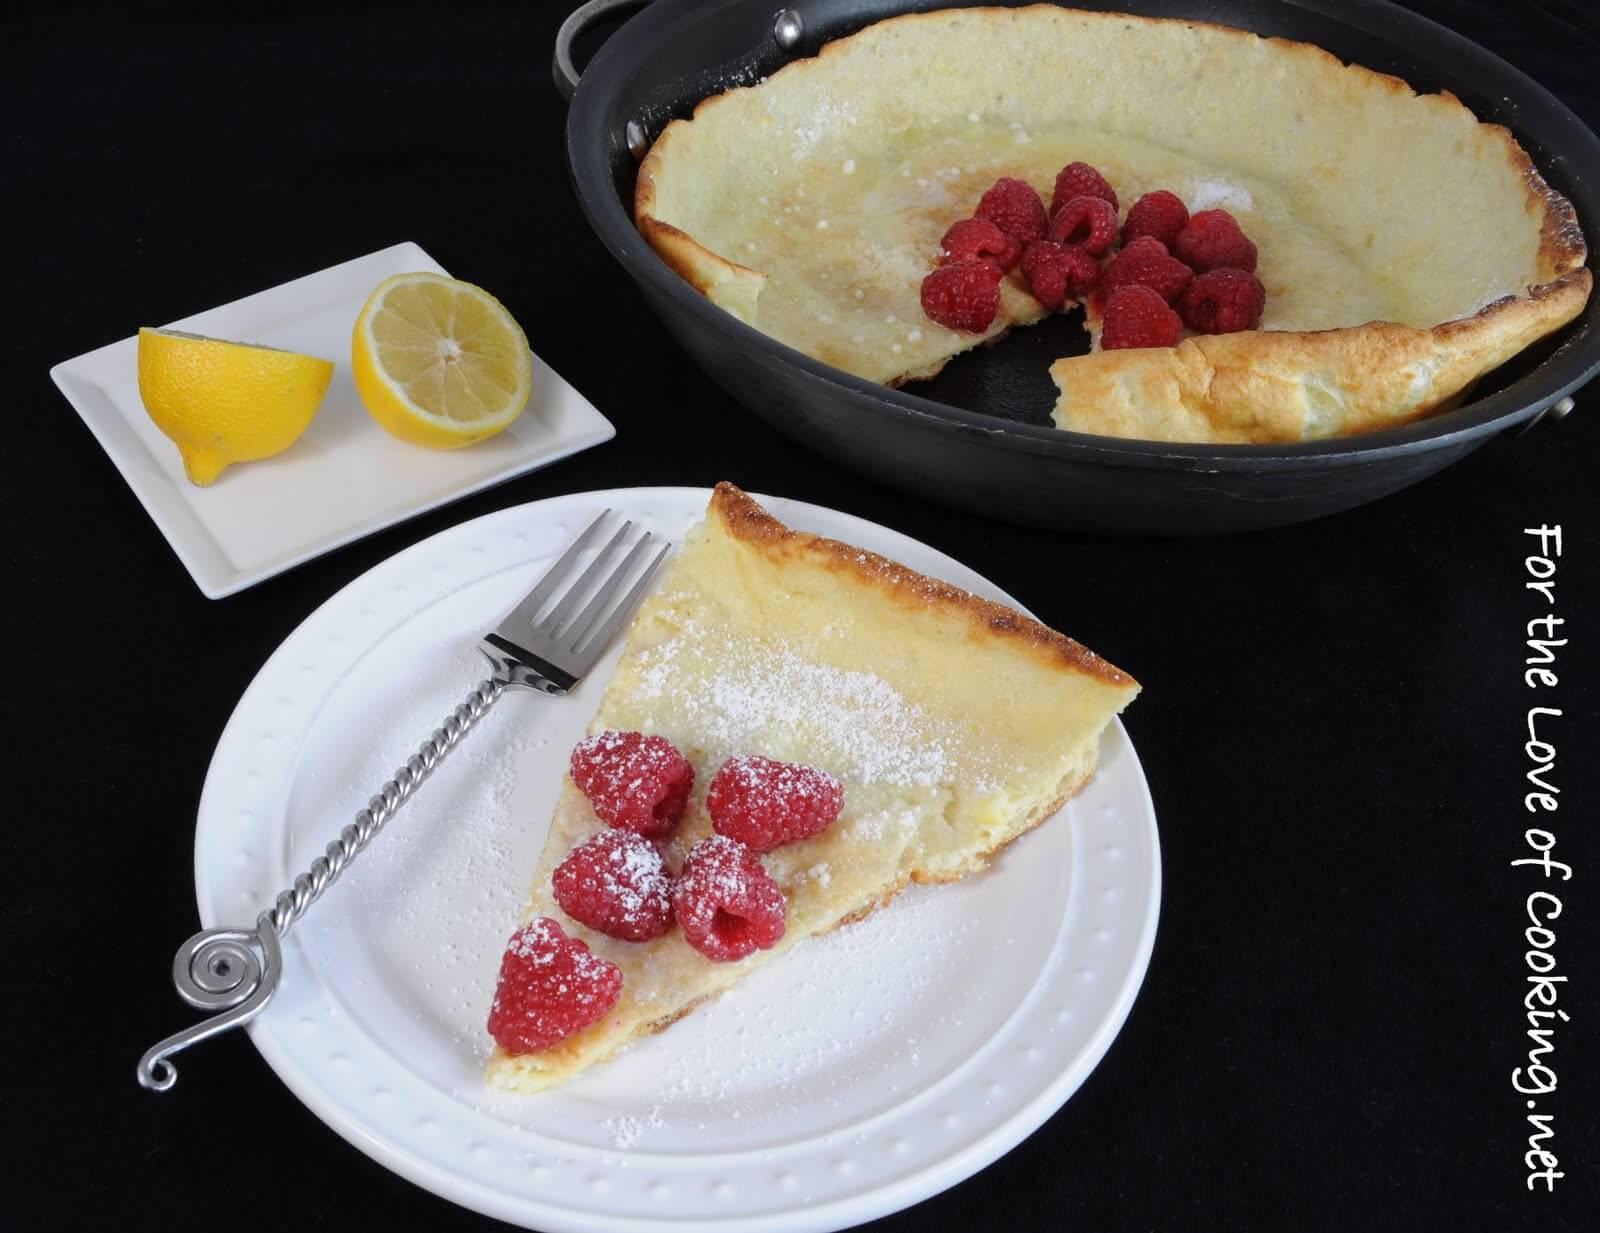 German Pancake with Lemon and Raspberries